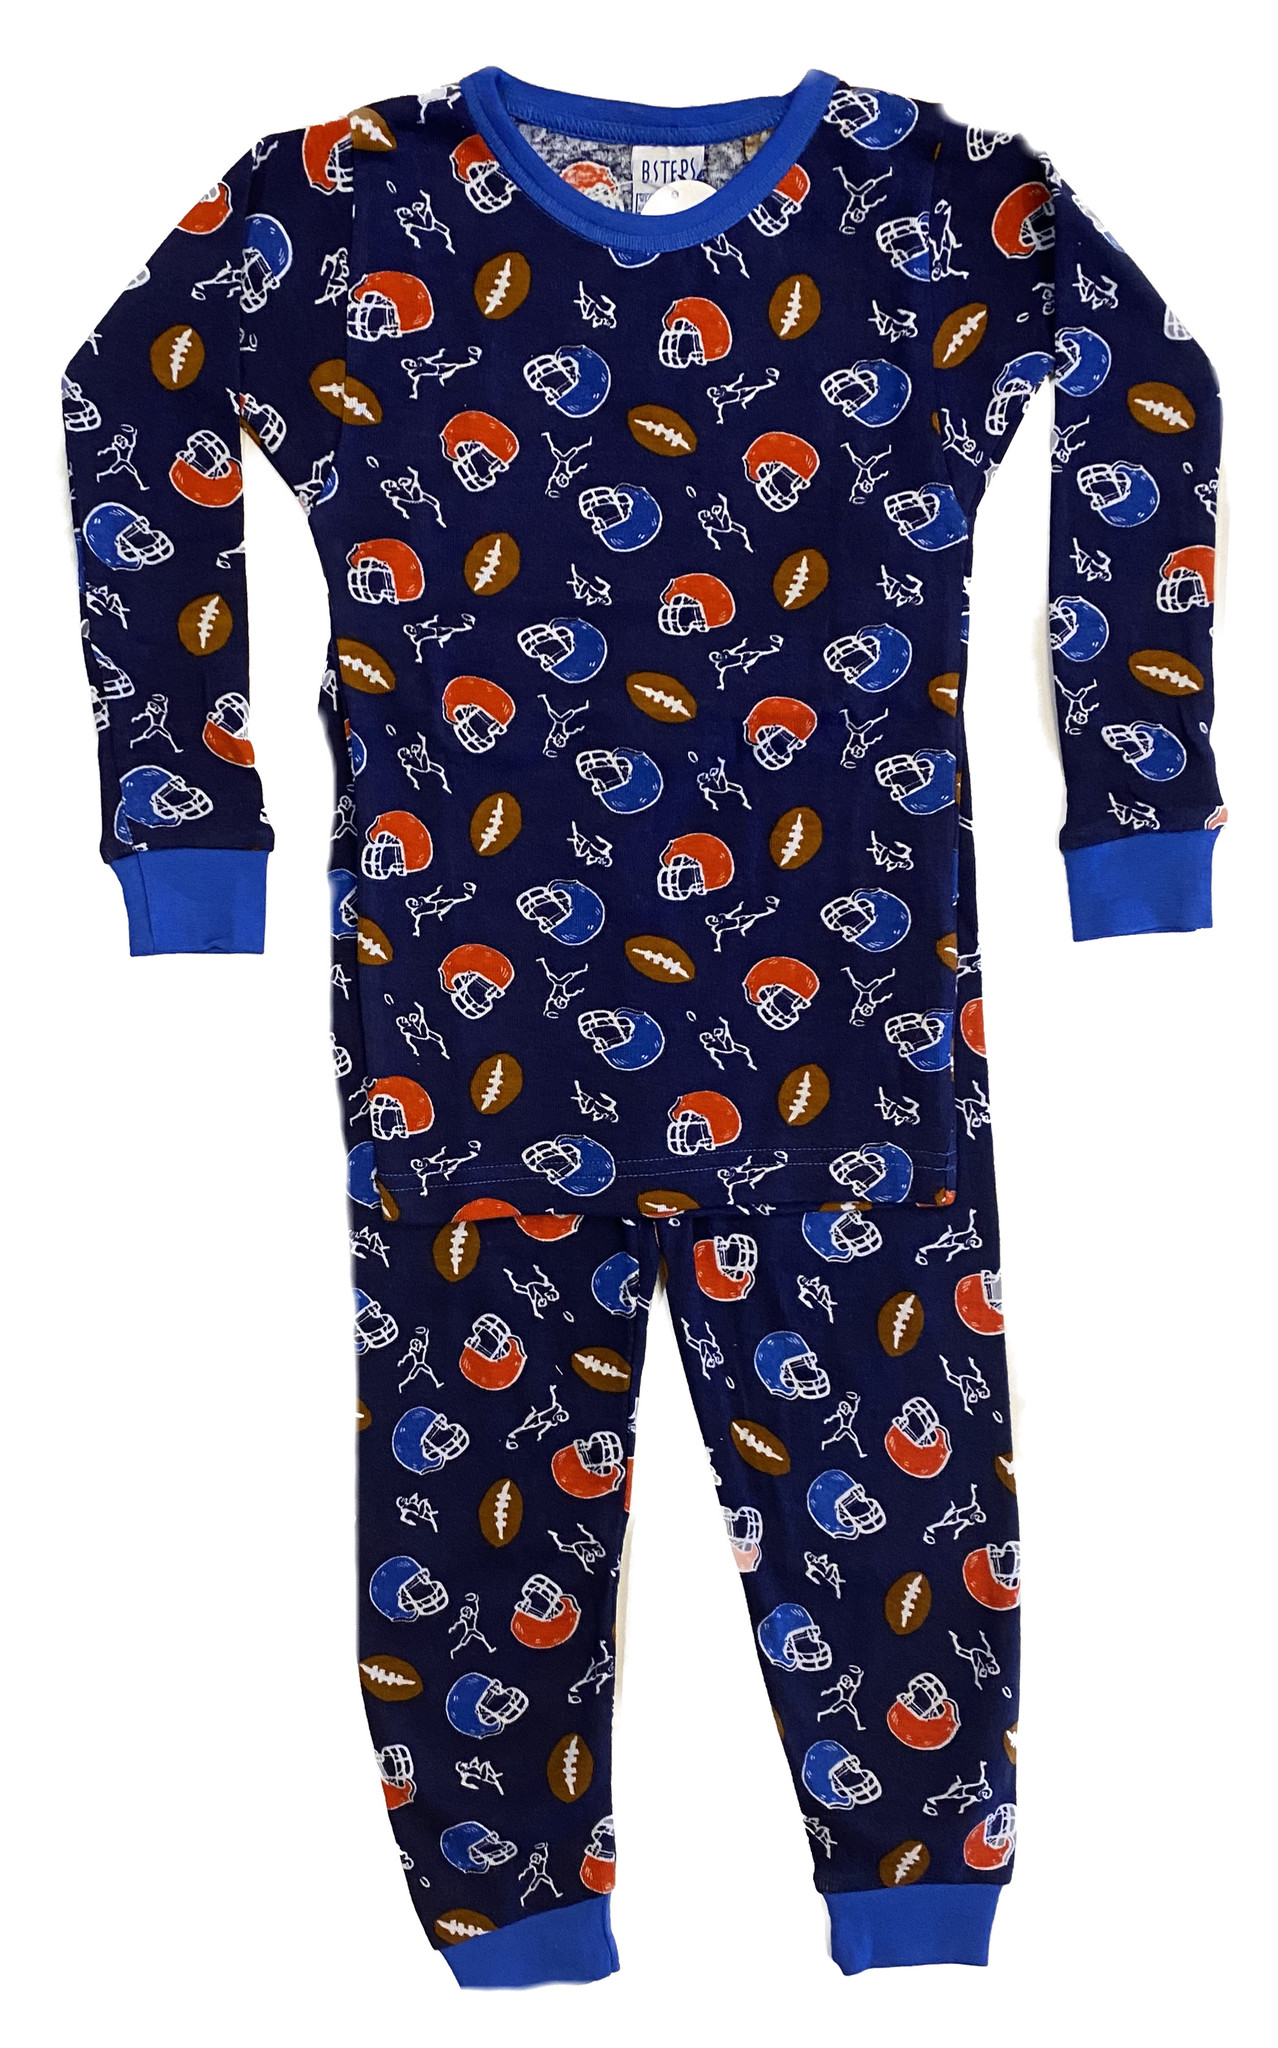 Baby Steps Navy Football PJ Set